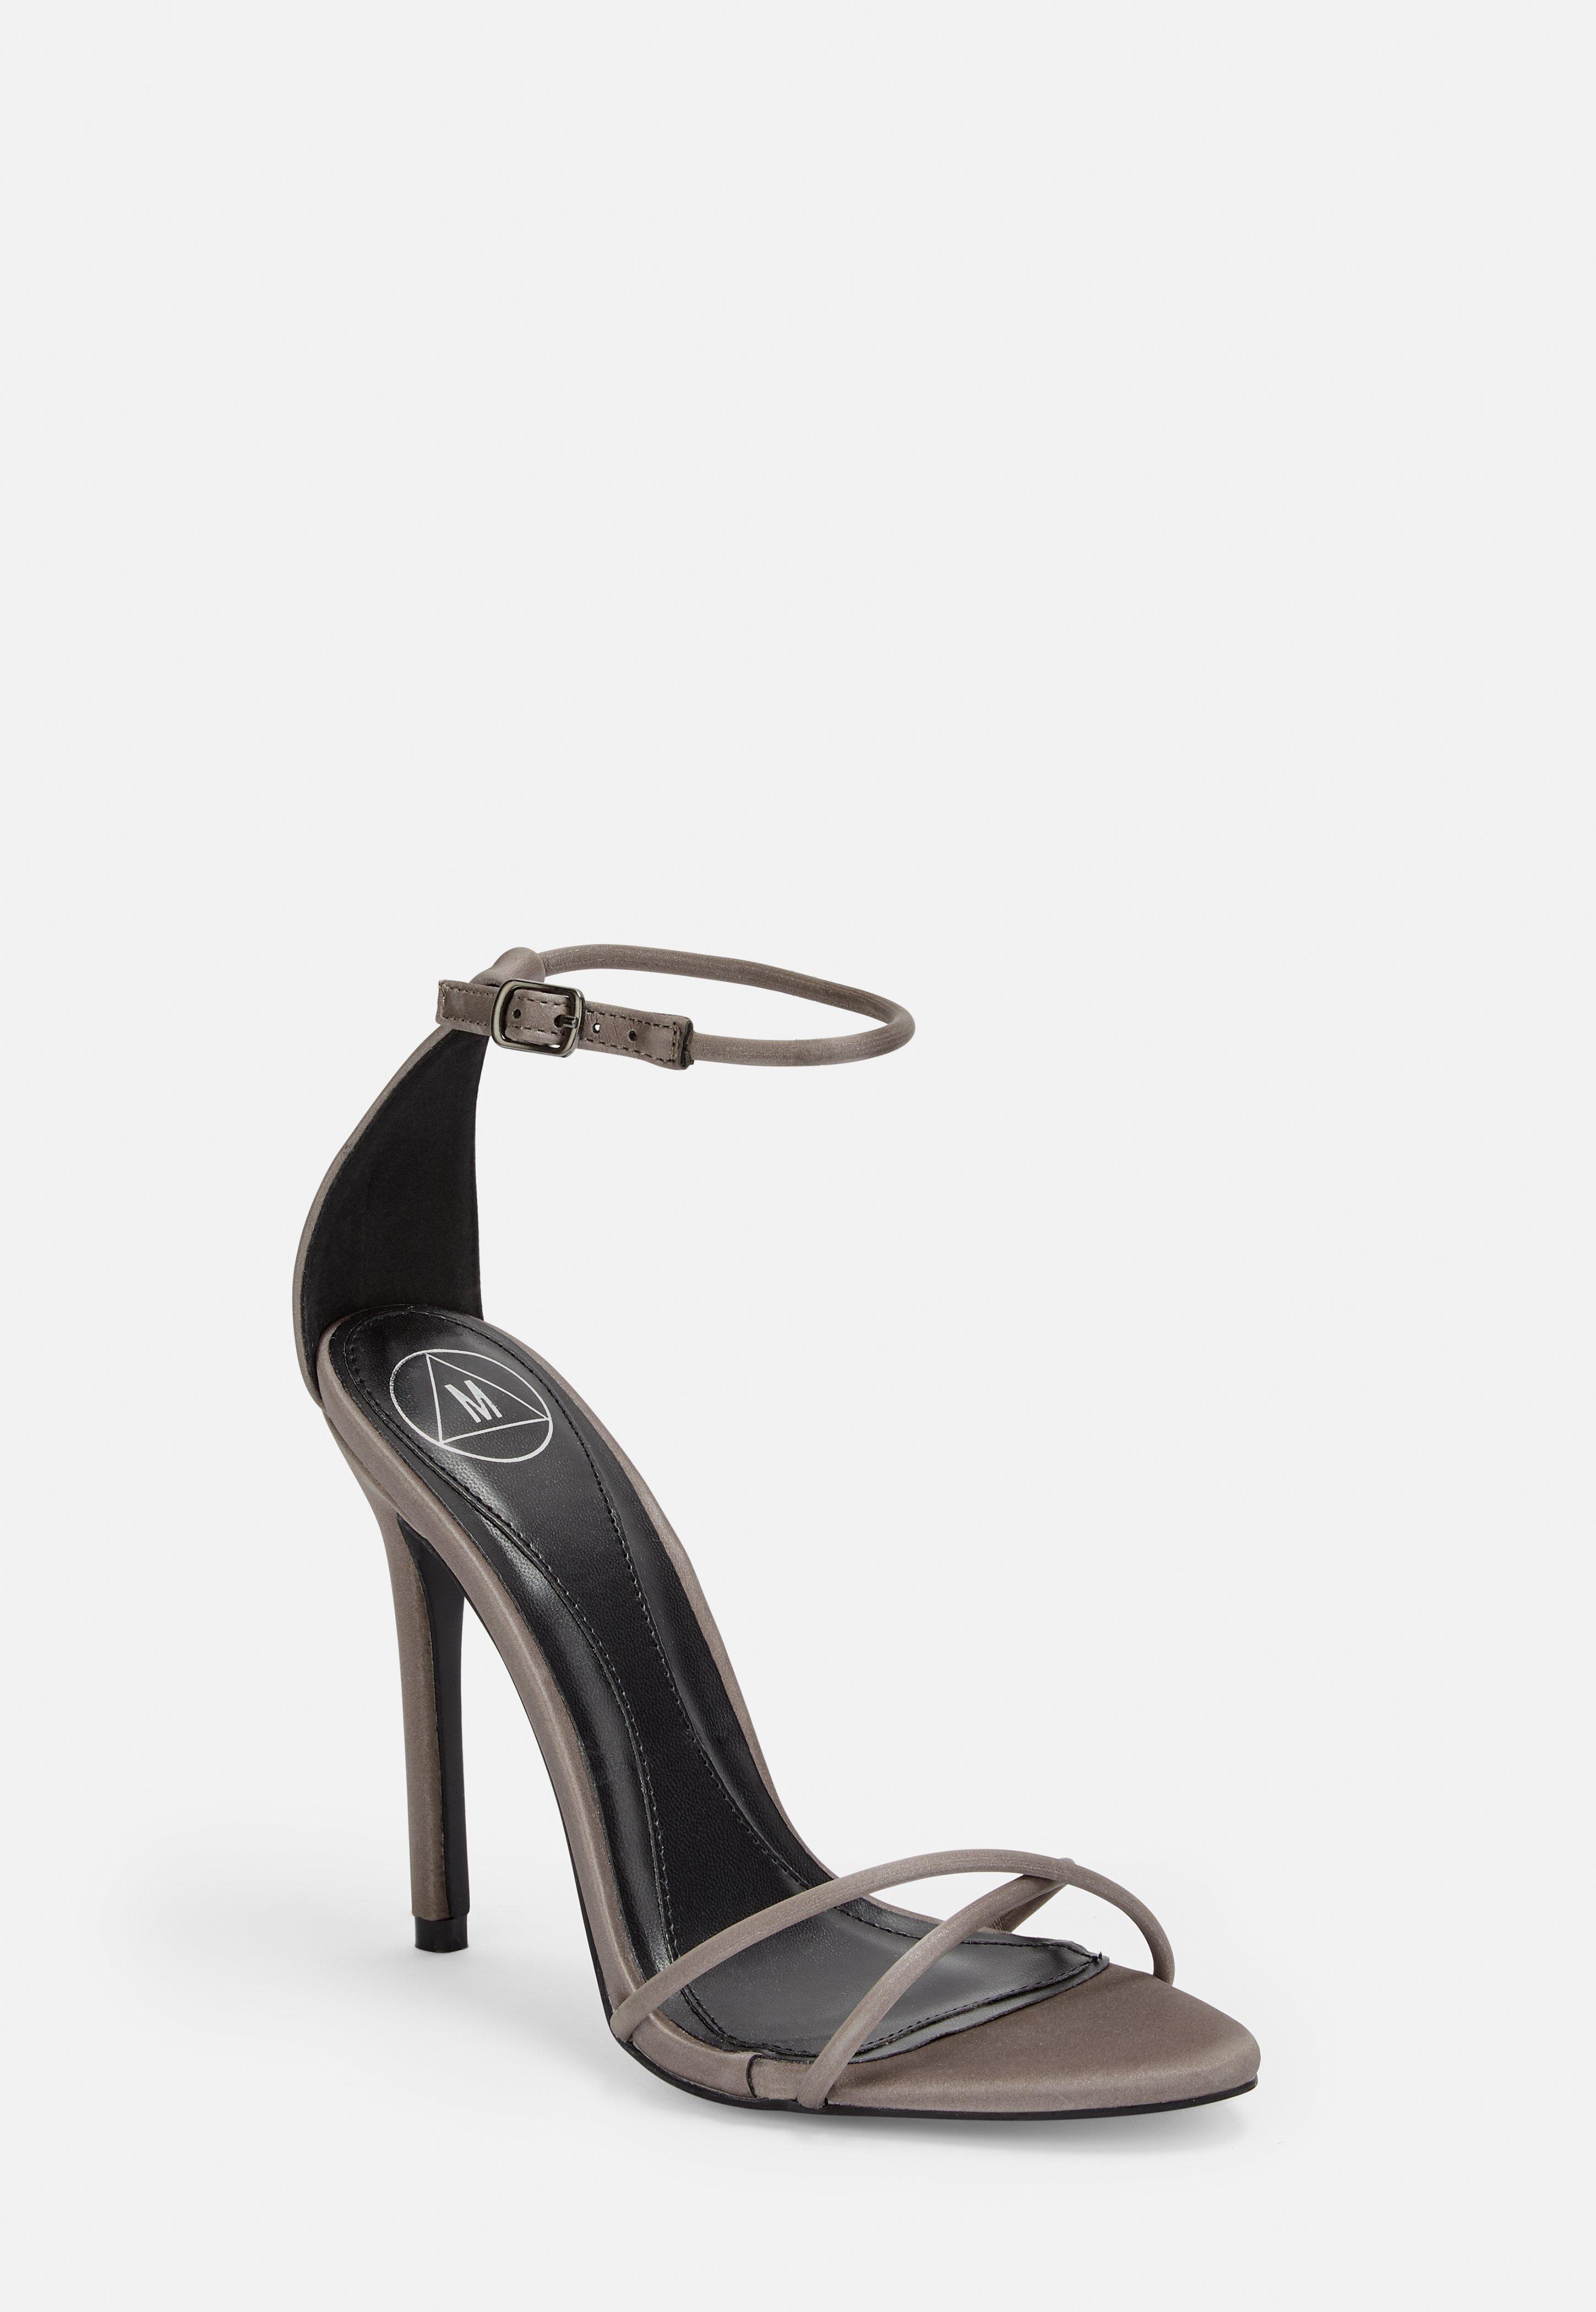 Strap Grey Cross Faux Leather Stiletto Heels m8Nn0wvO